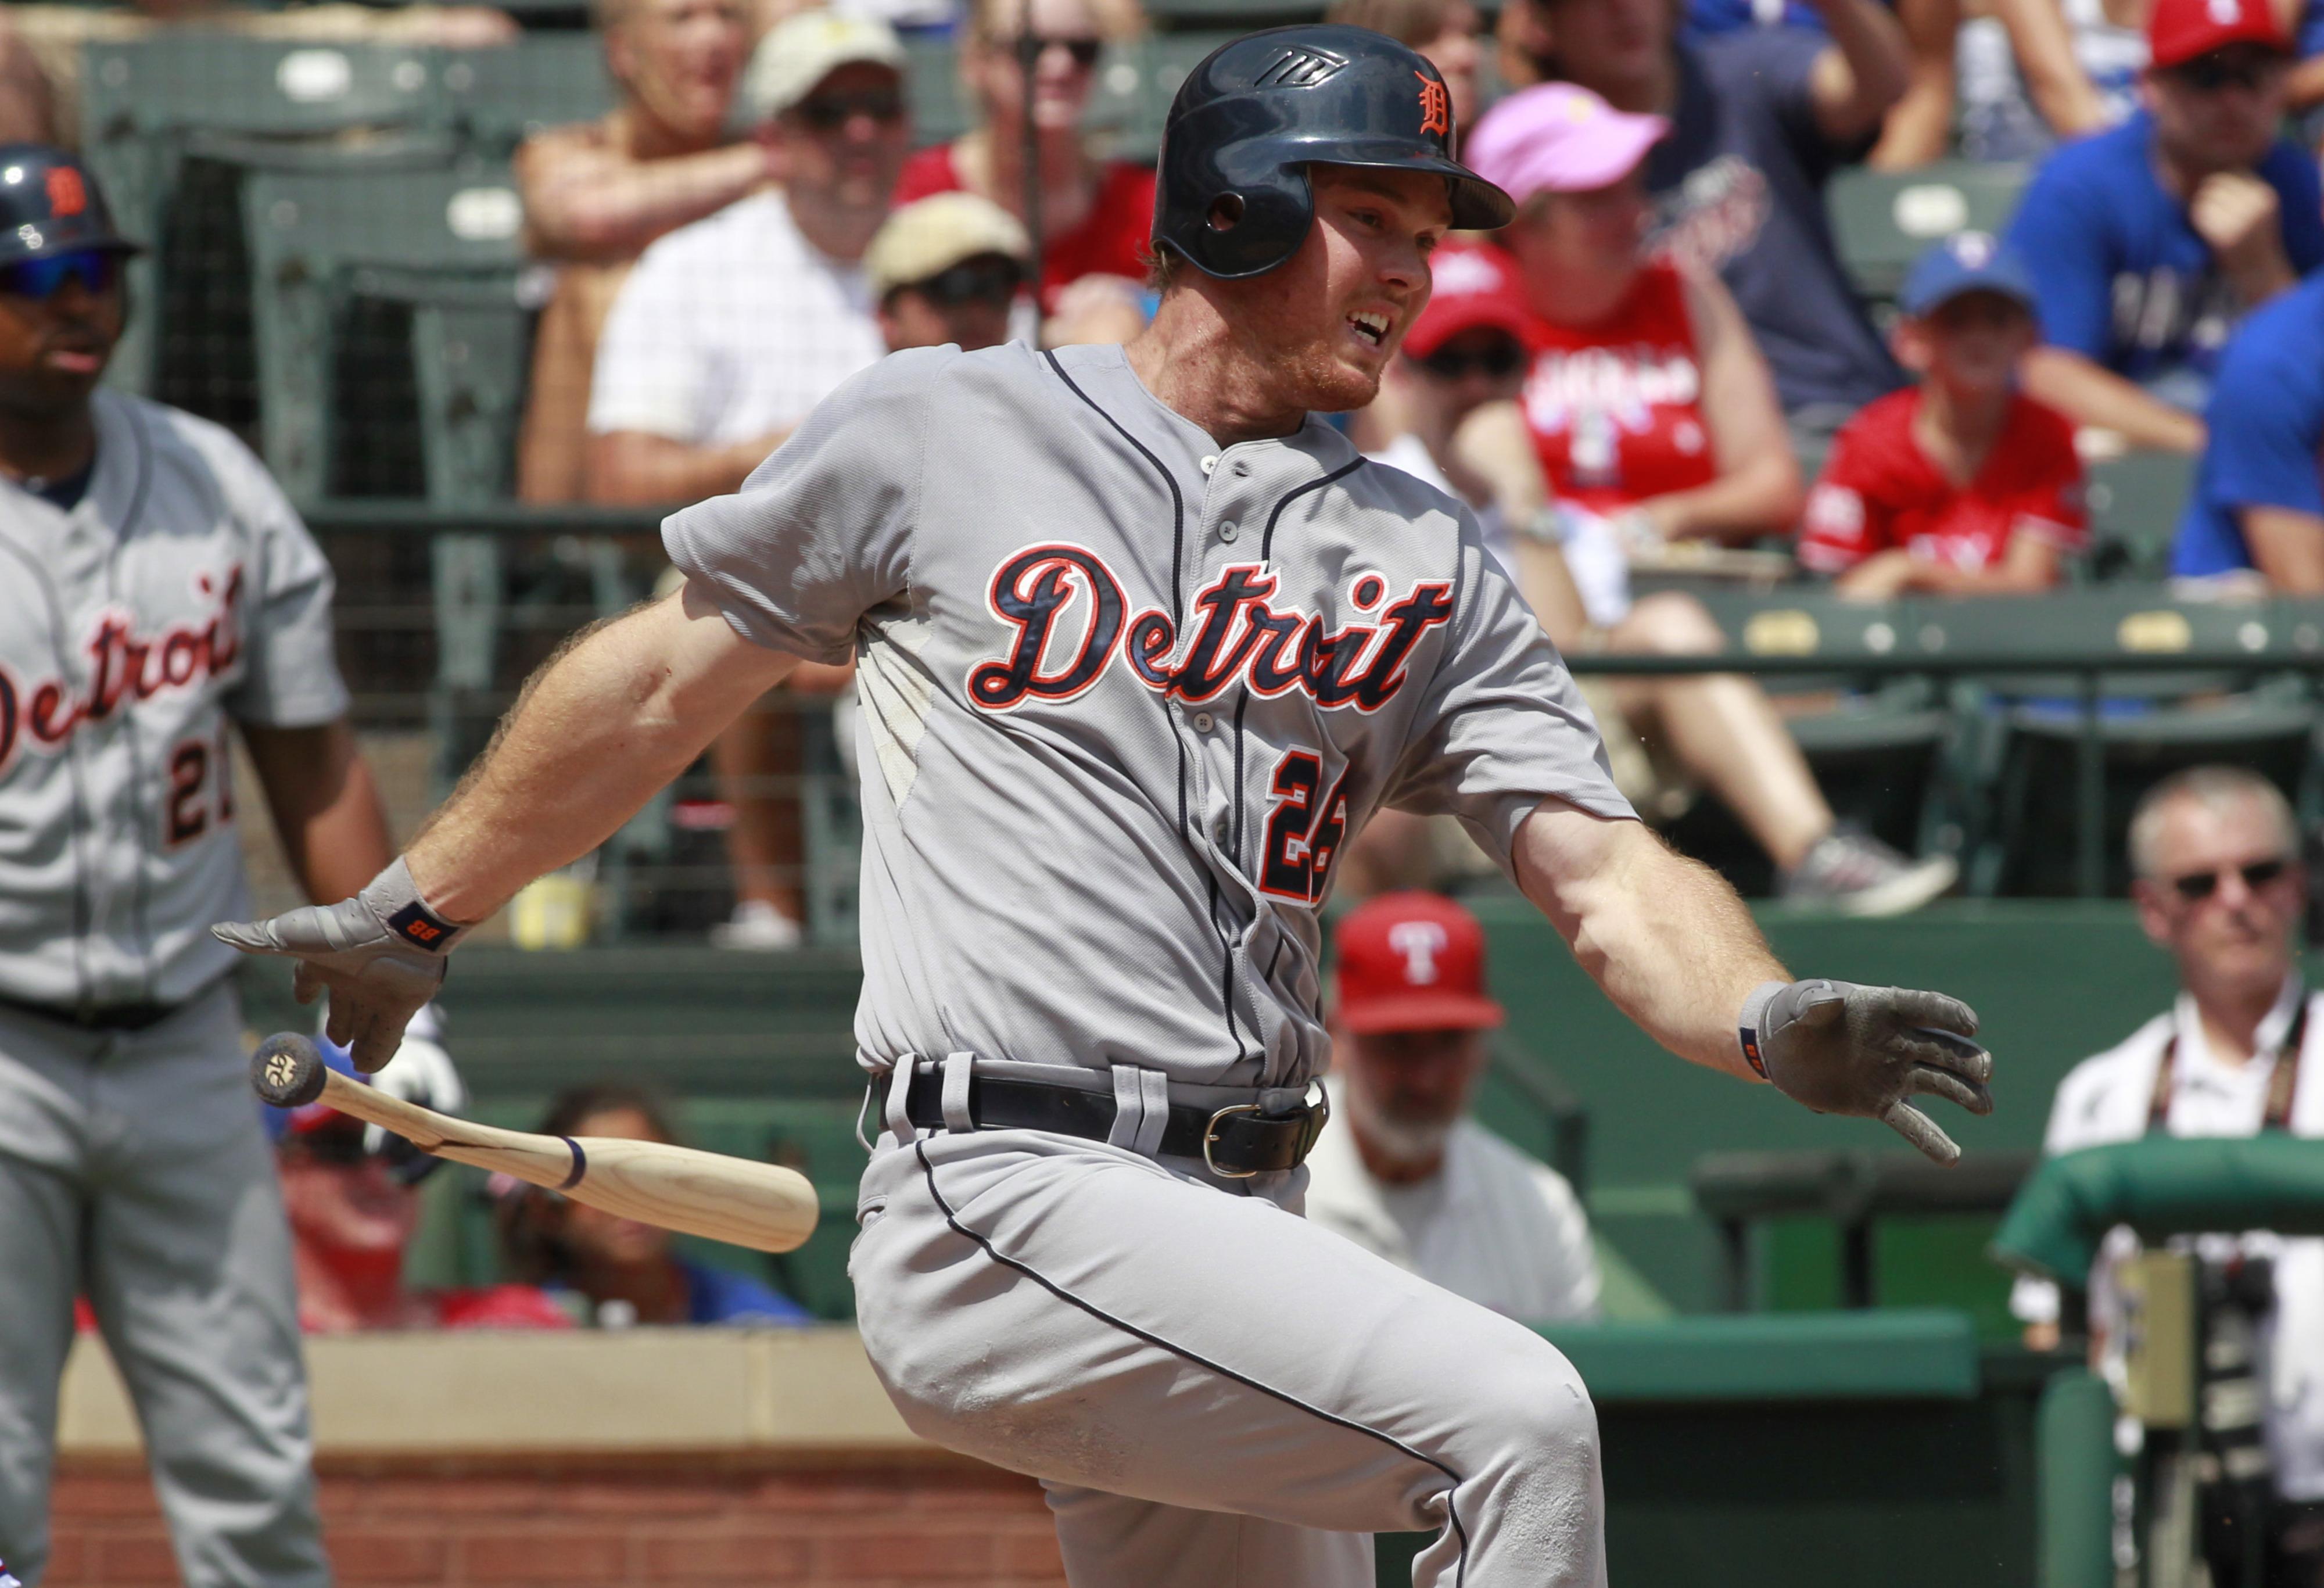 Aug 12, 2012; Arlington, TX, USA; Detroit Tigers right fielder Brennan Boesch (26) at bat during the game against the Texas Rangers  at Rangers Ballpark. Mandatory Credit: Tim Heitman-US PRESSWIRE